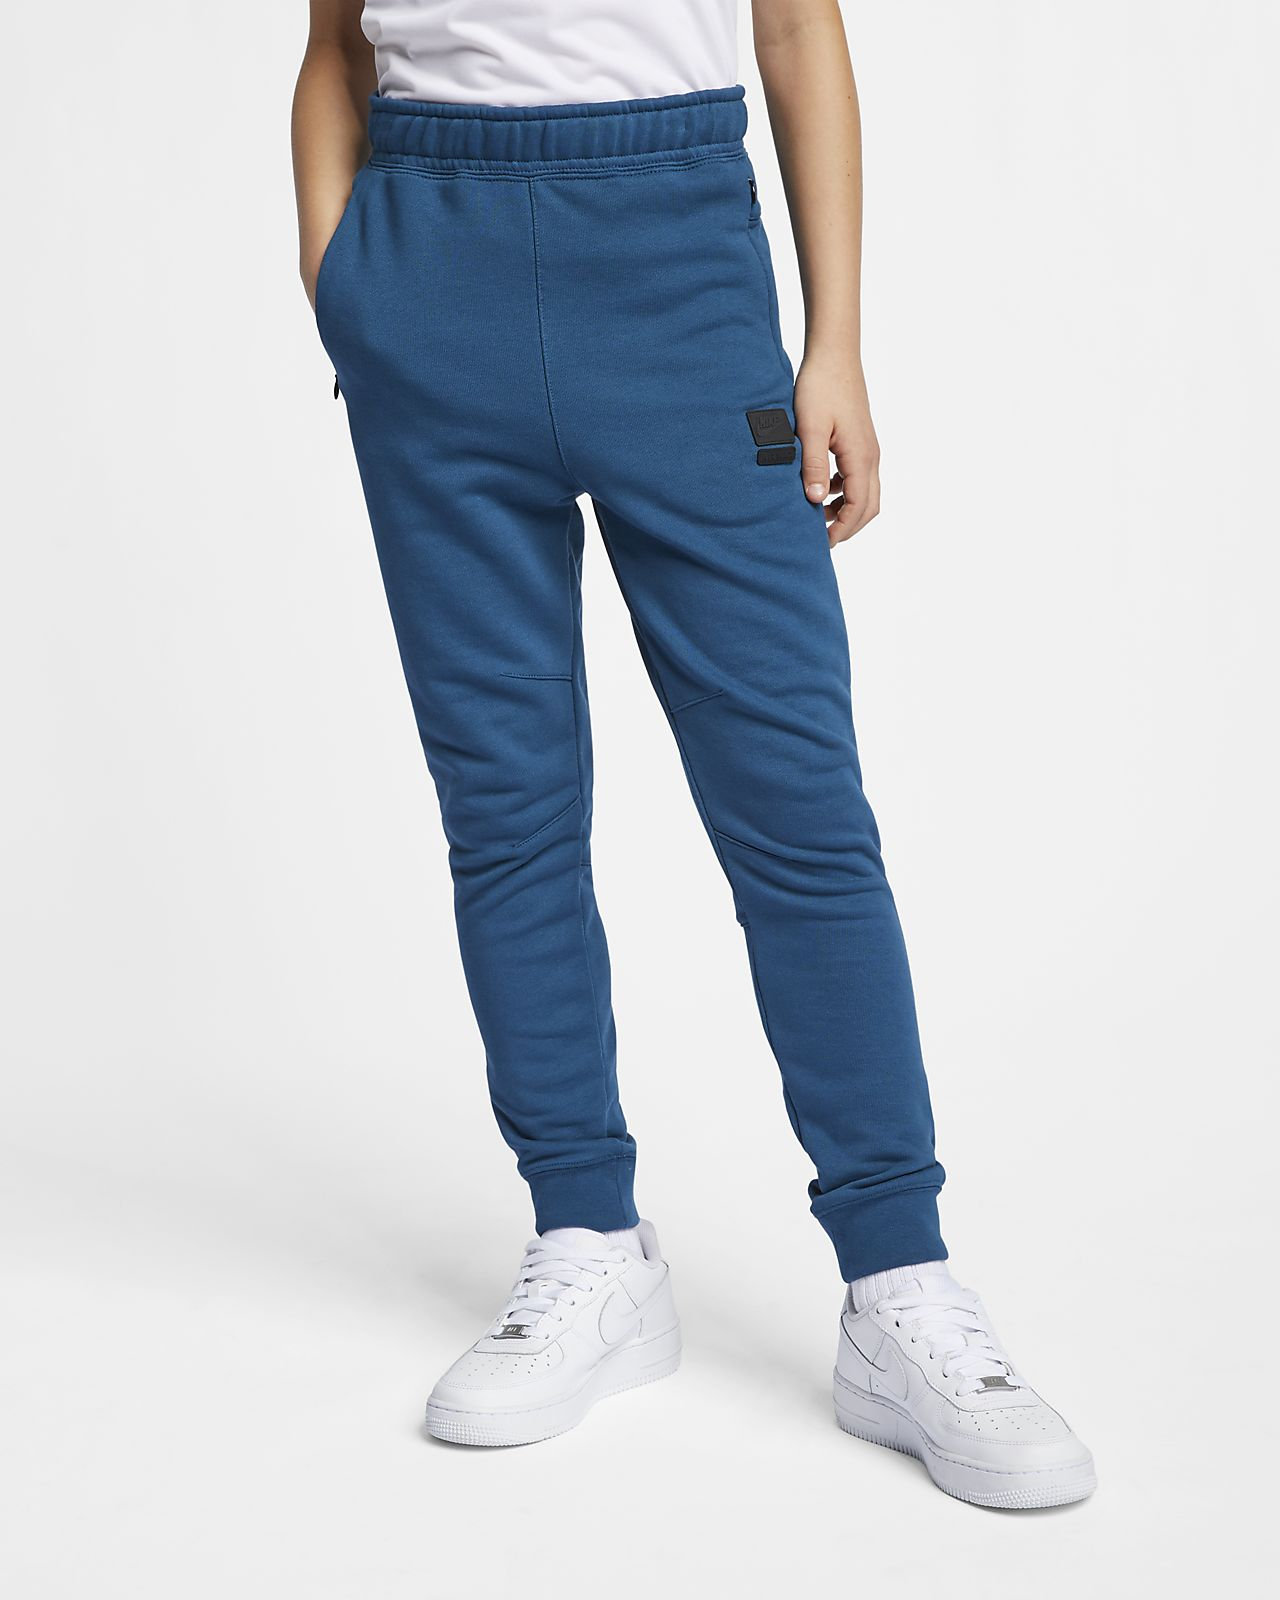 Nike Sportswear Pantalons - Nen